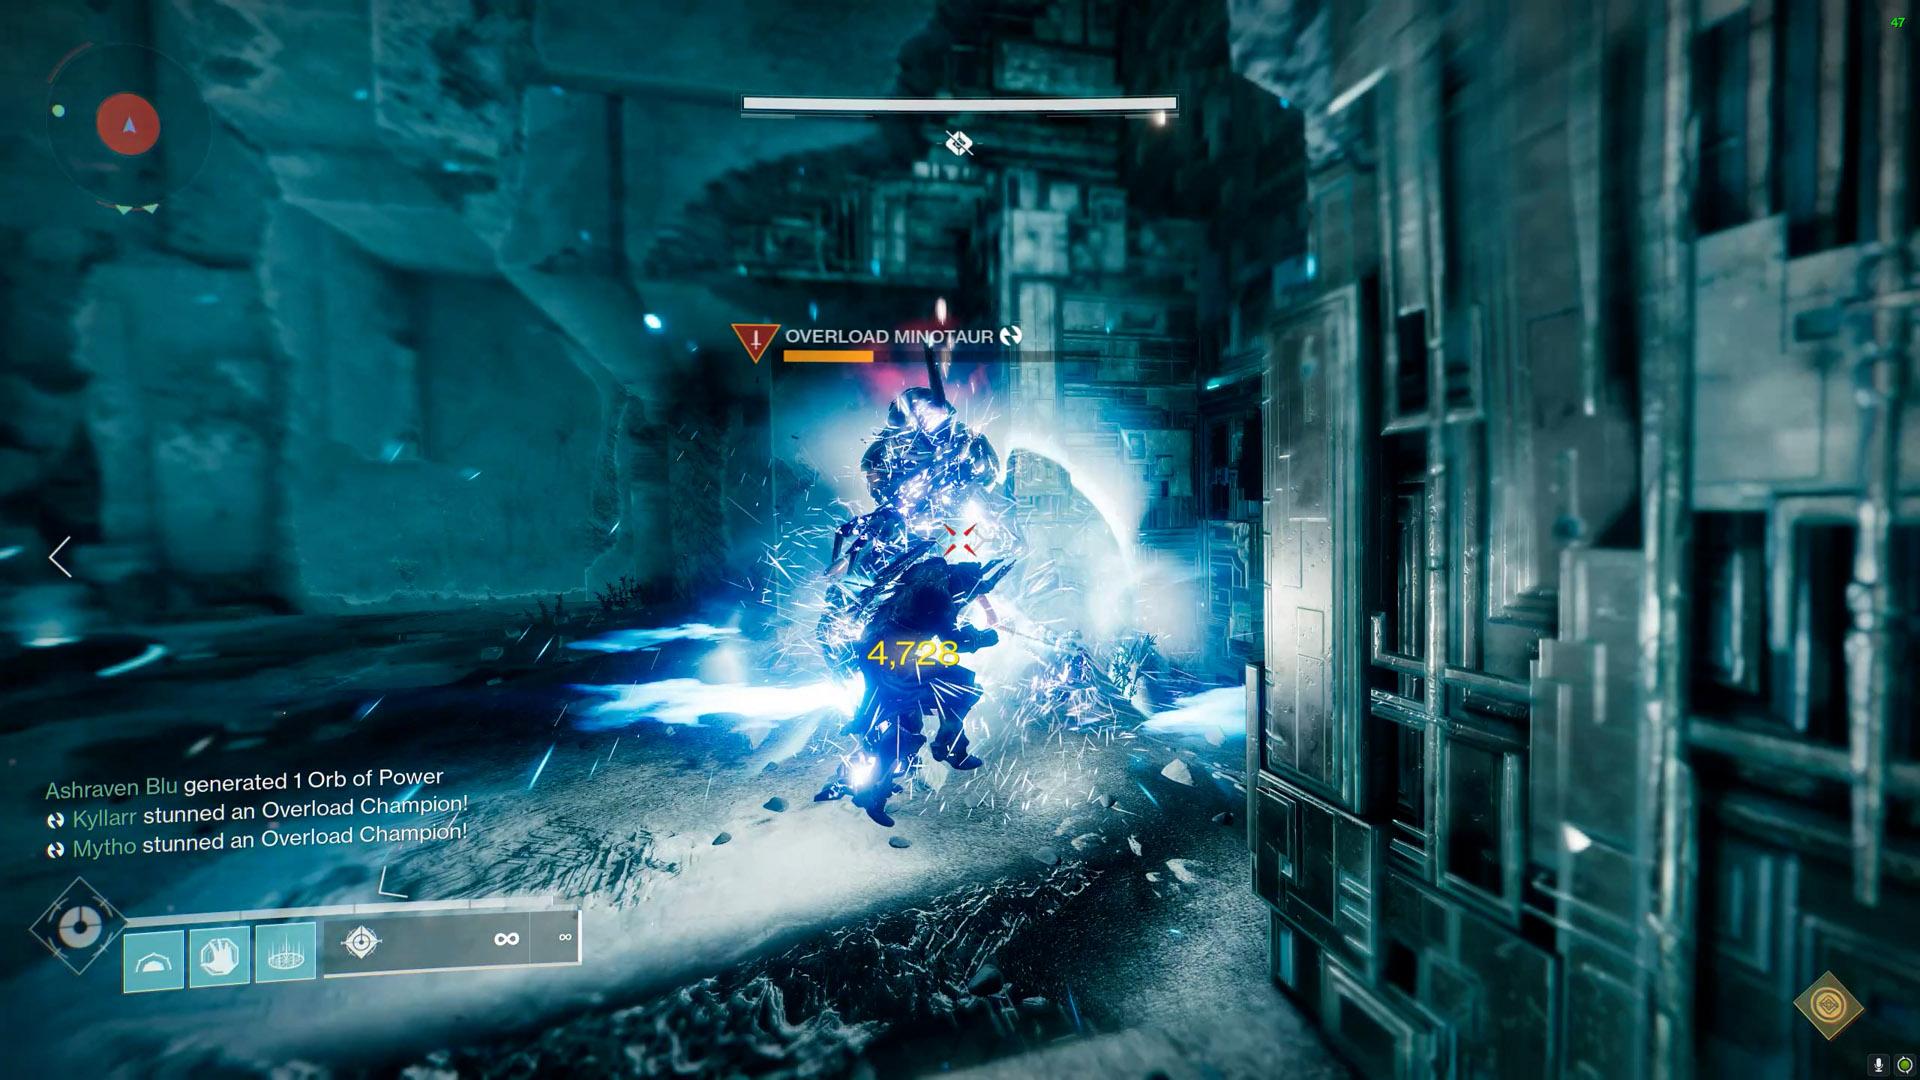 destiny 2 vault of glass gatekeeper overload minotaur